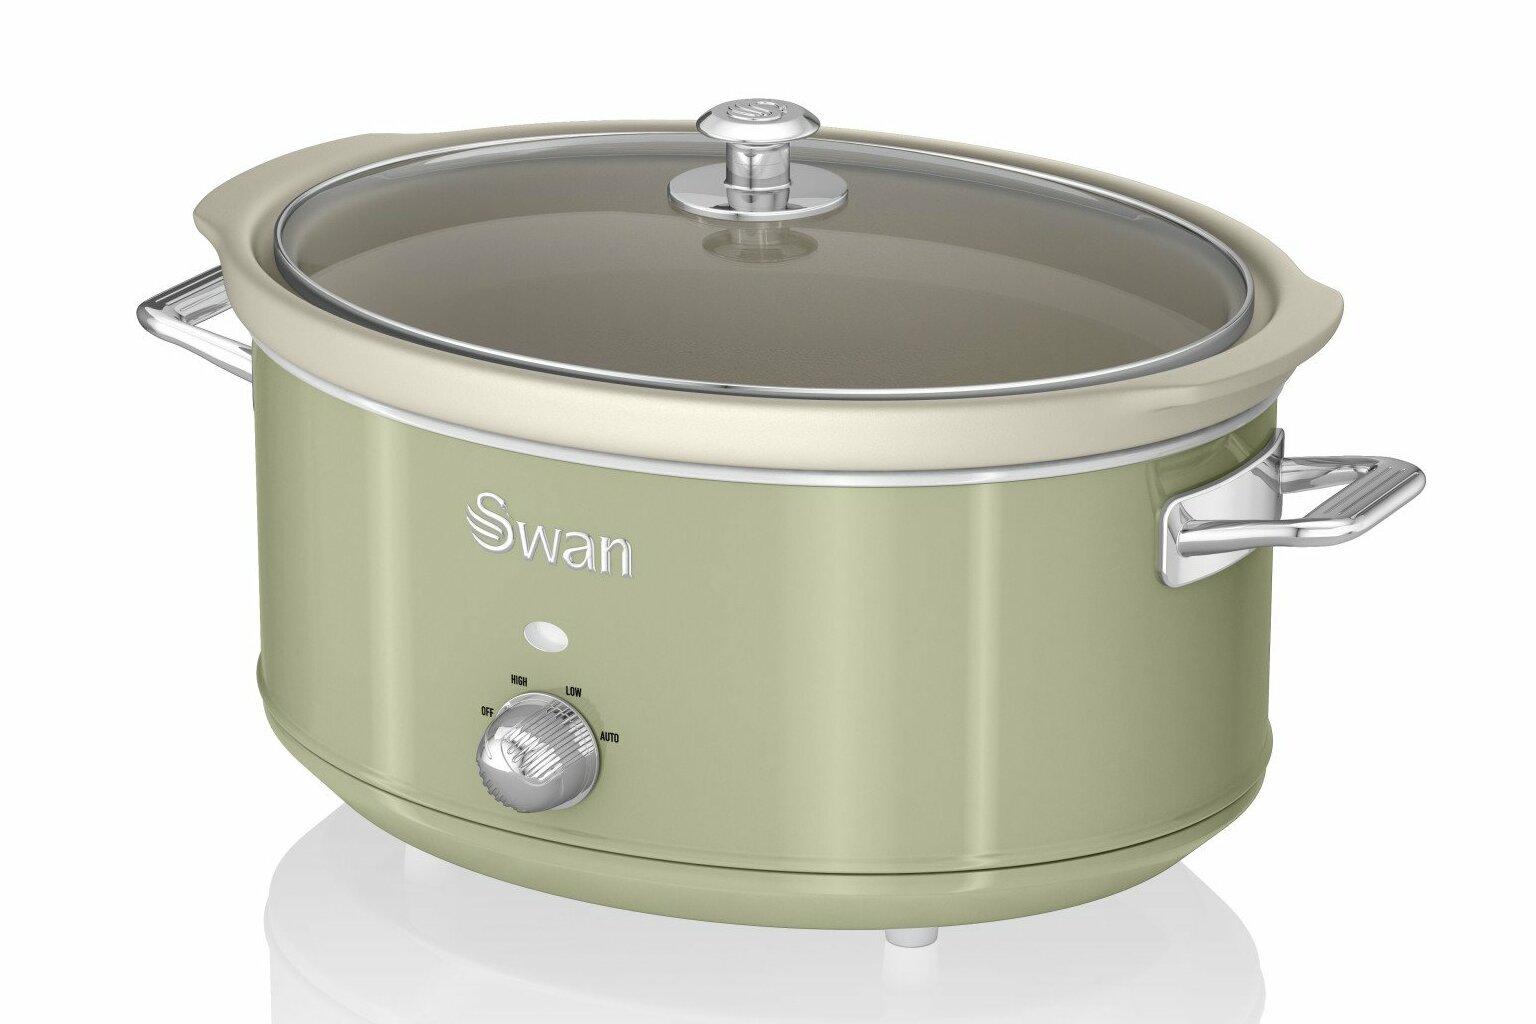 Swan Retro Blue 6.5L Slow Cooker Removable Ceramic Pot SF17031BLN